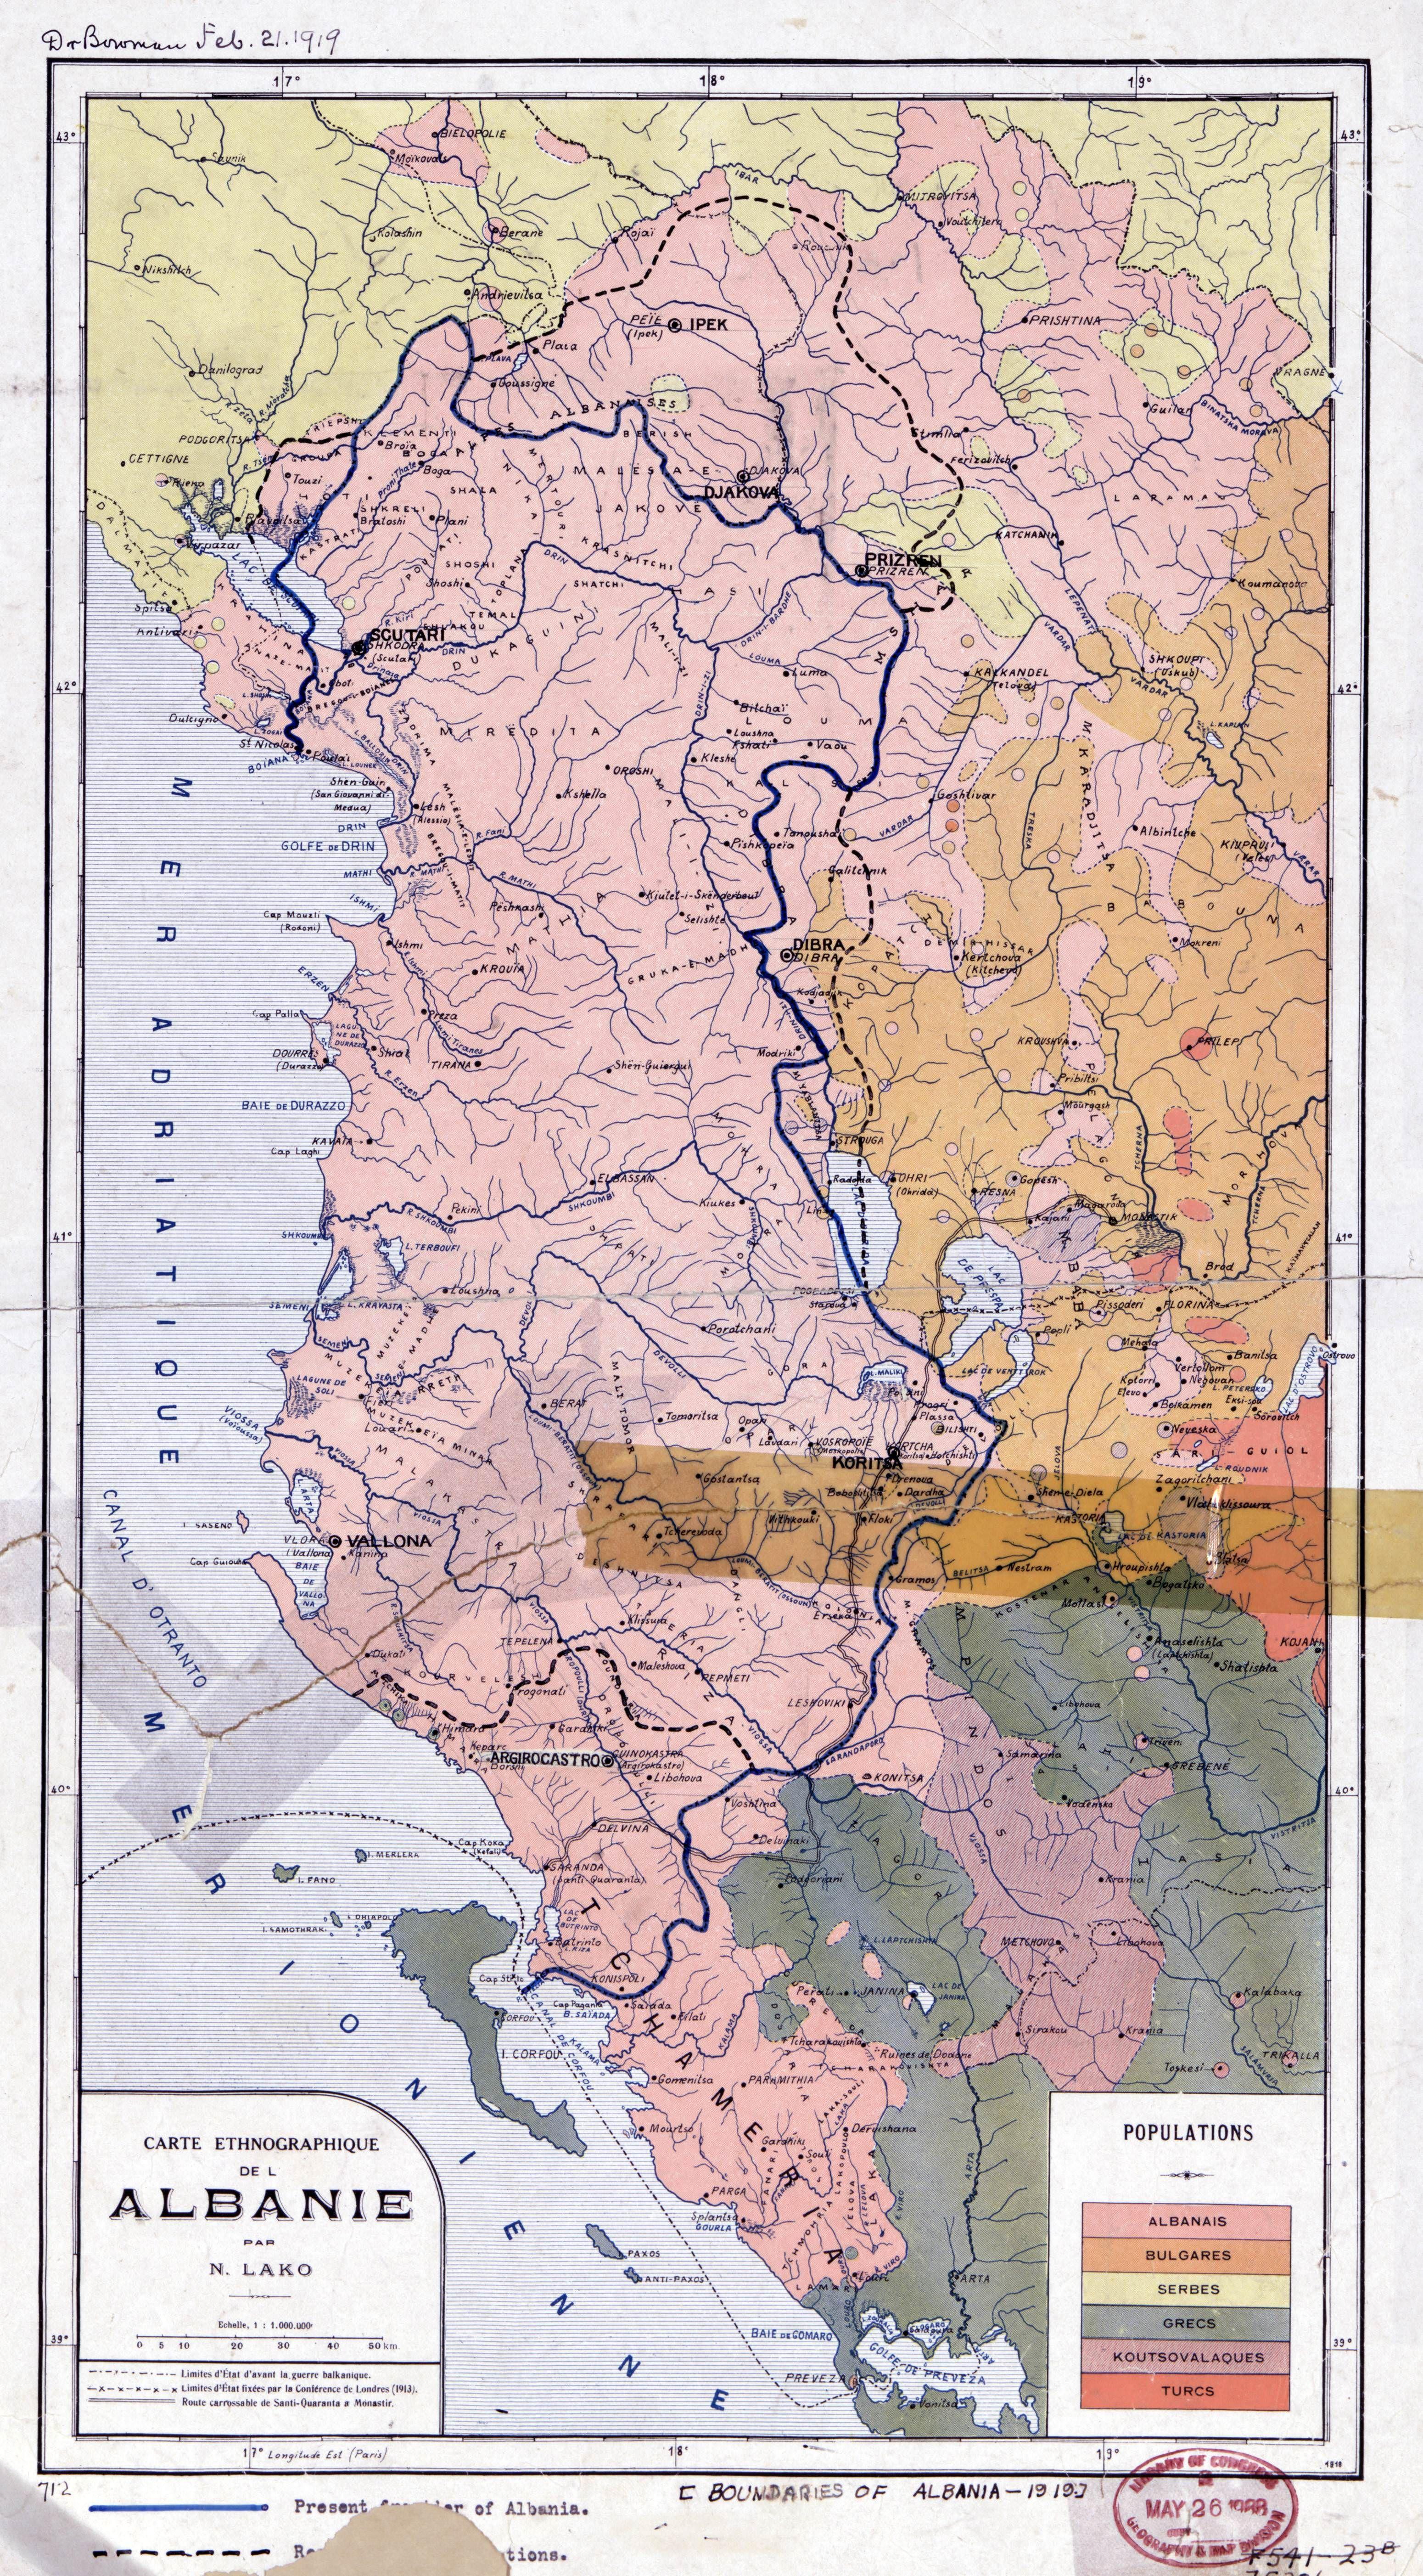 Ethnographic Map Of Albania 1918 Terkep Tortenelem